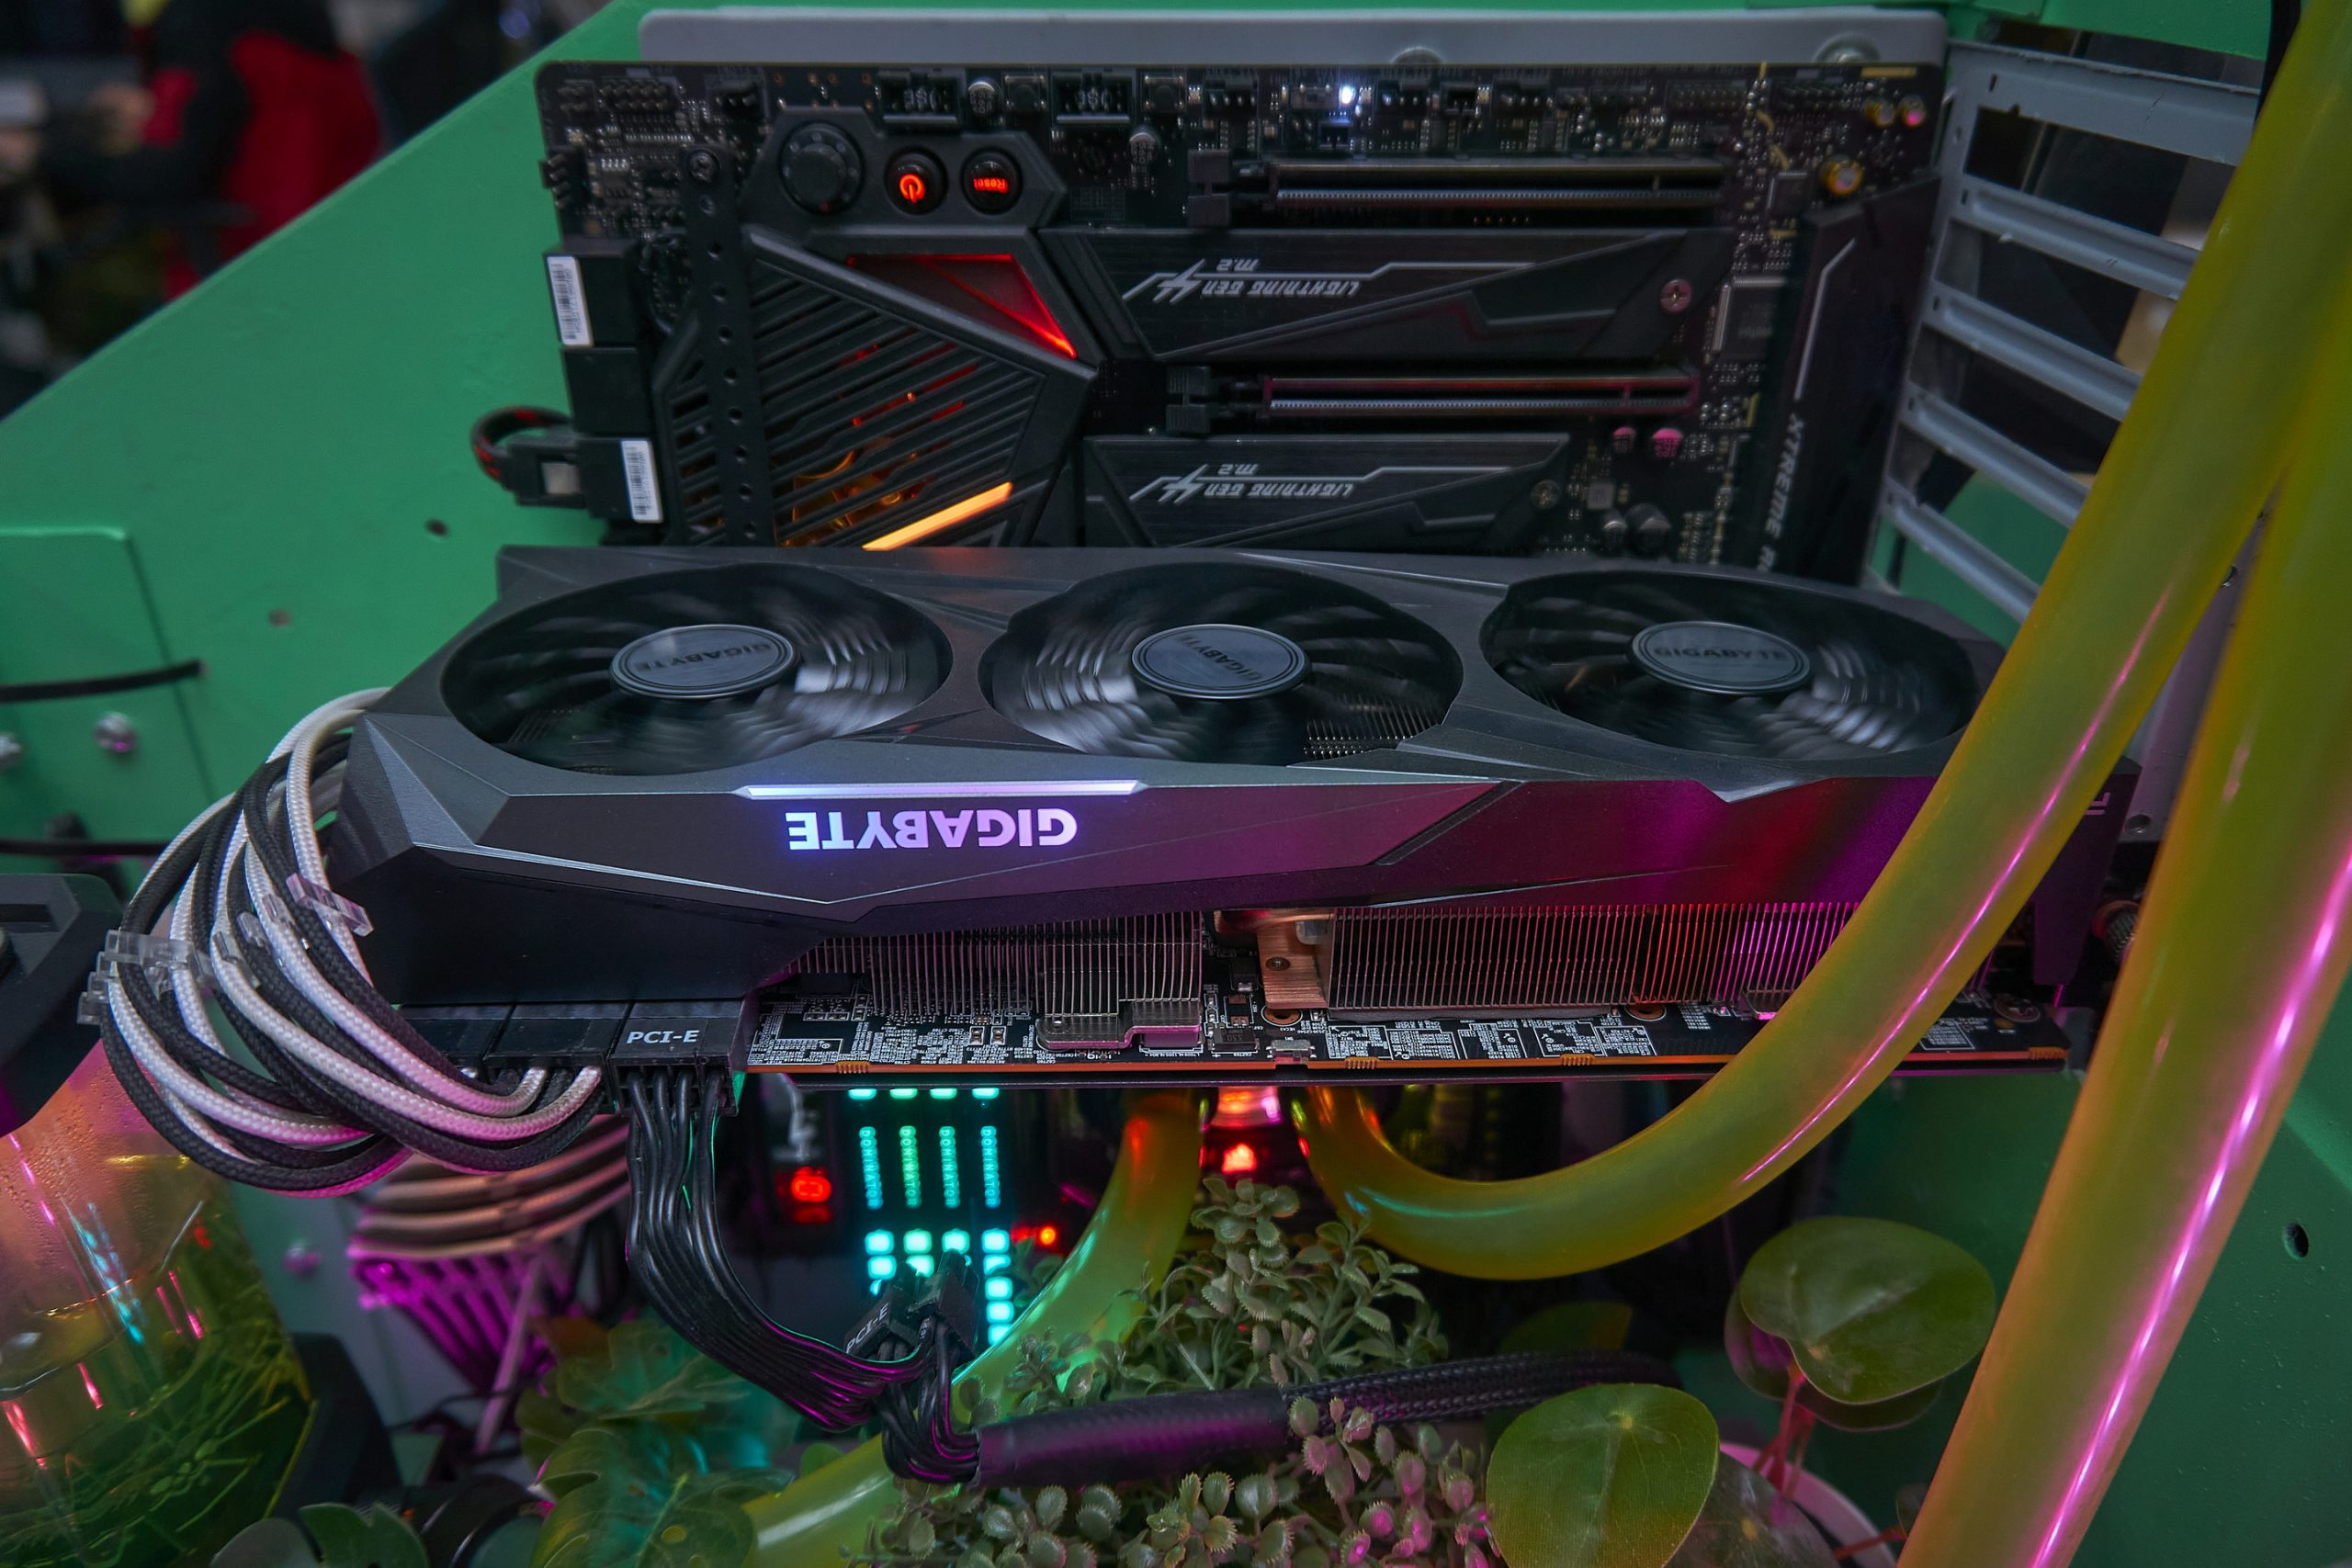 Gigabyte AMD Radeon RX 6900 XT Gaming OC review | WASD